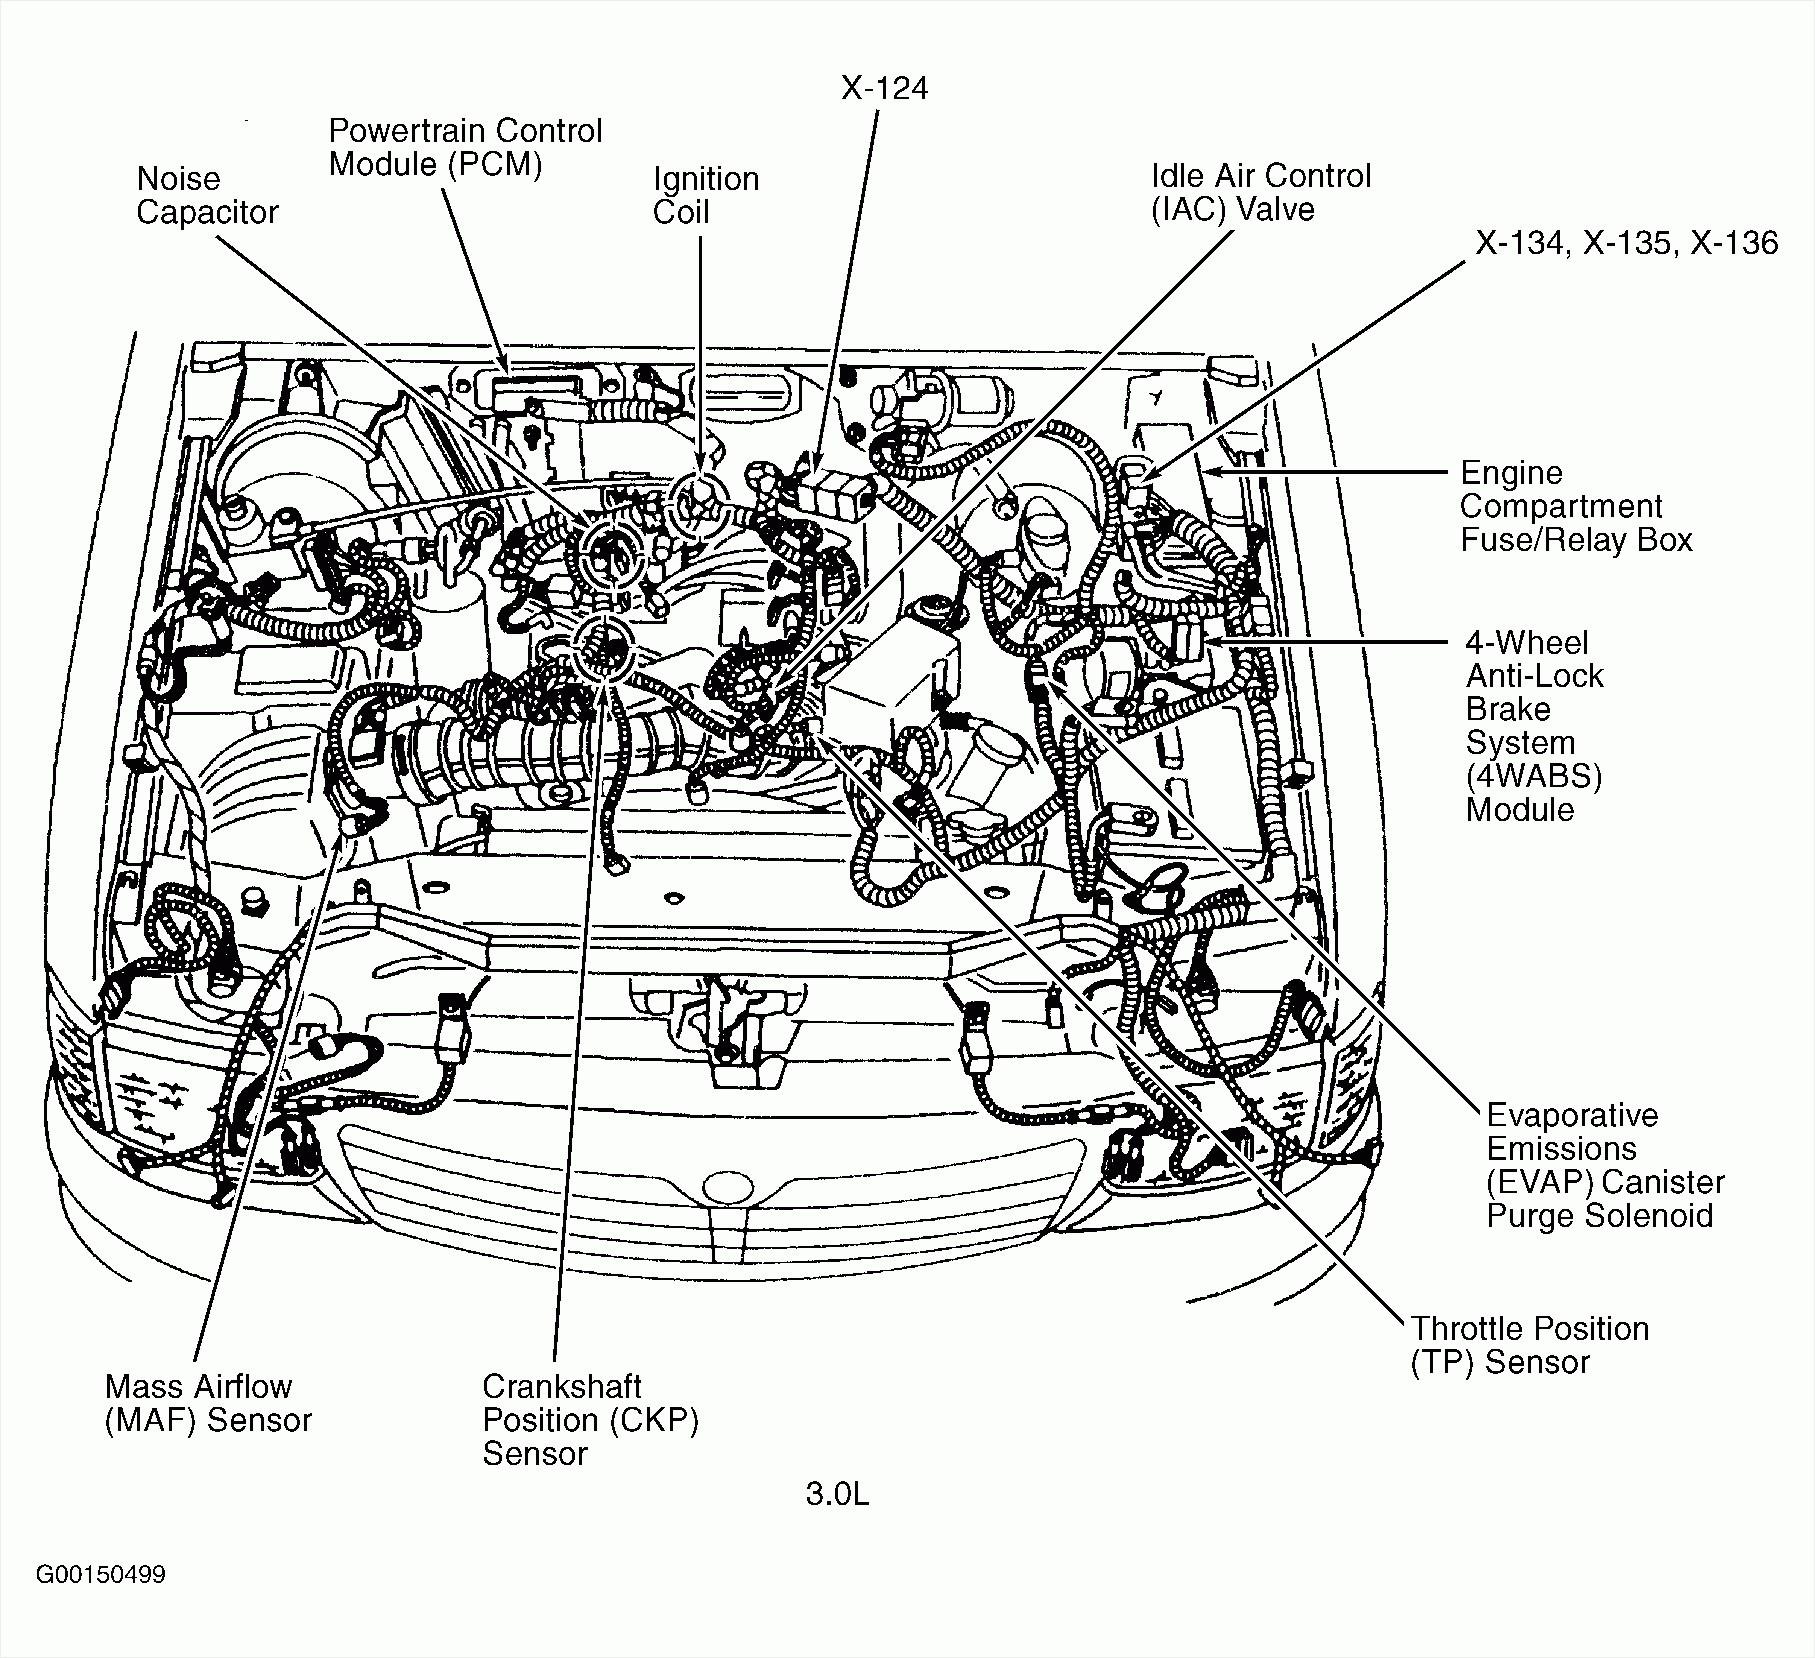 Ford Ranger Engine Diagram Engine Valve Timing Diagram to Replace Timing Belt ford Ranger 3 Of Ford Ranger Engine Diagram